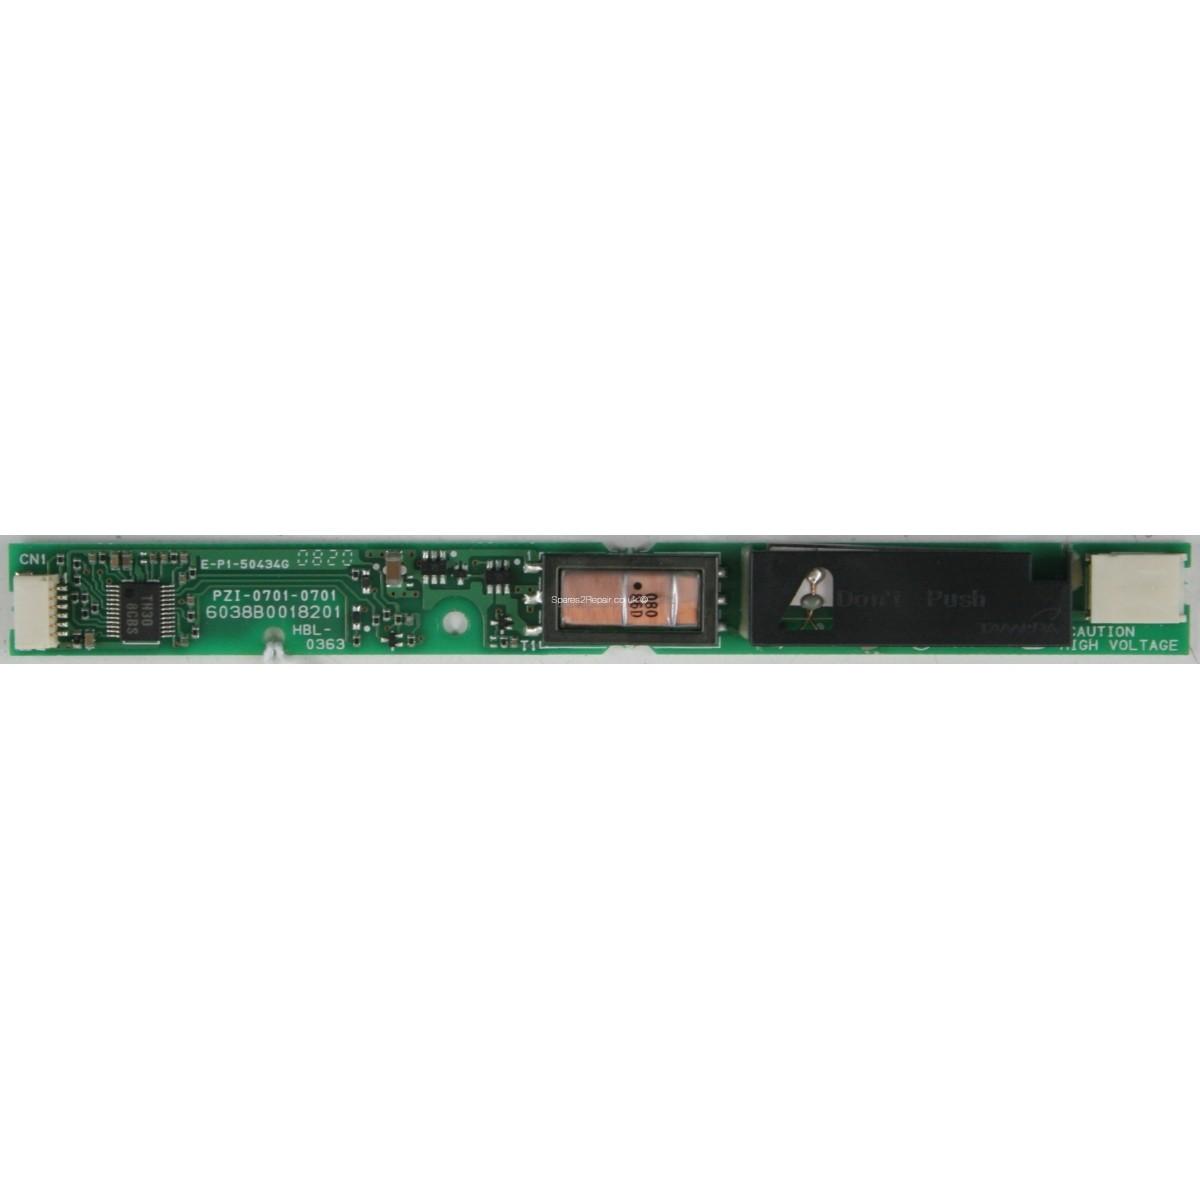 Inverter P/ Notebook Toshiba Satellite A300 PZI-0701-0701